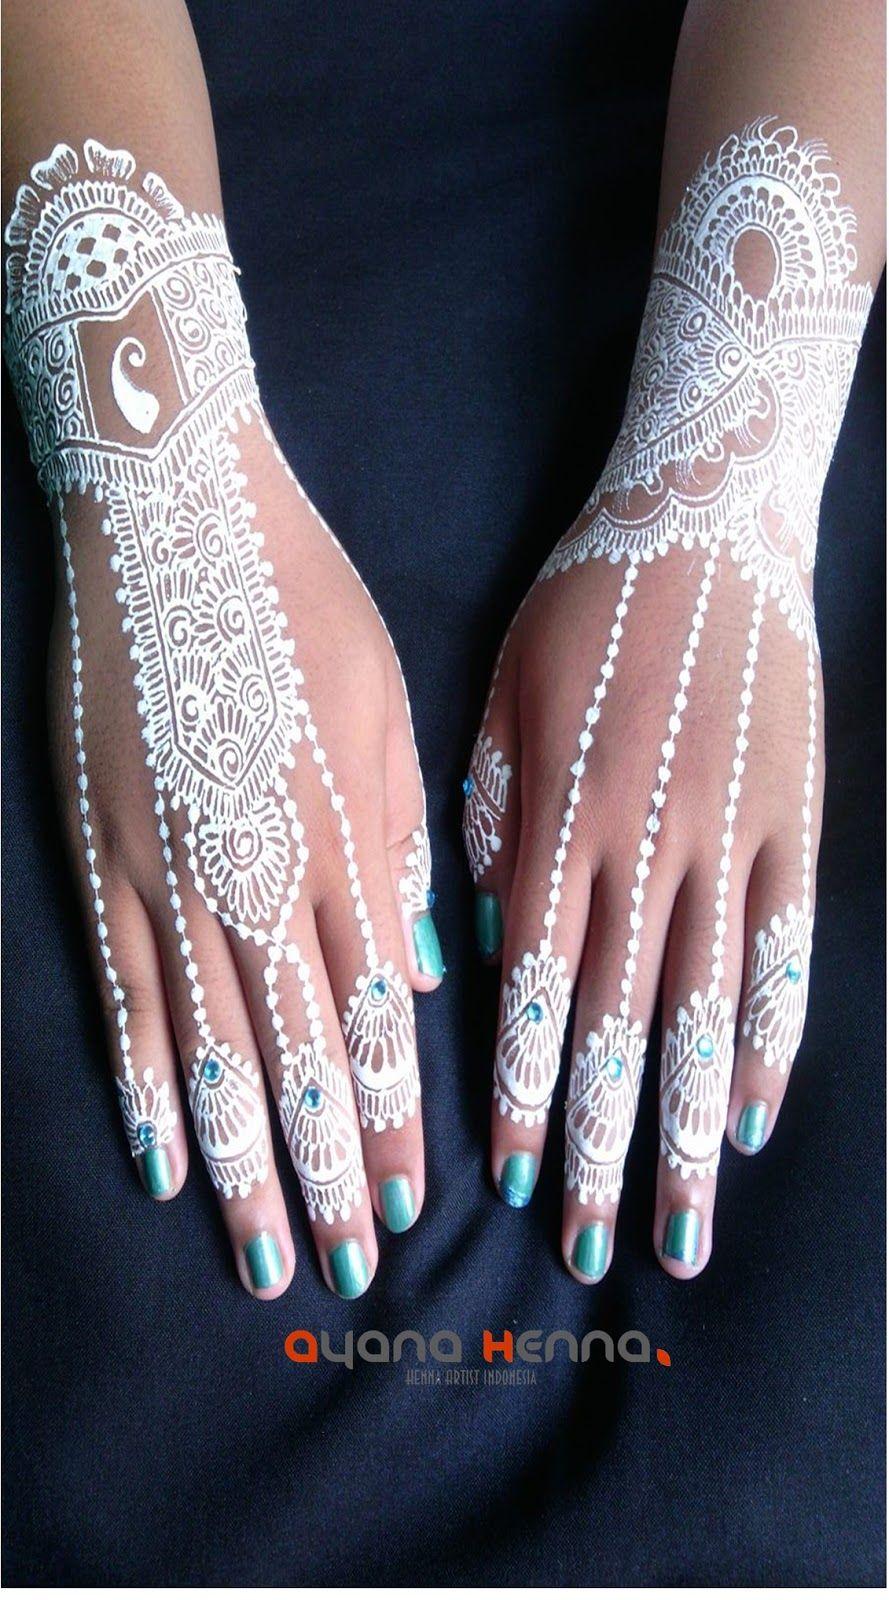 Merk Henna Yang Berbahaya : henna, berbahaya, Review, Henna, Putih, Paling, Modern, Nyaman